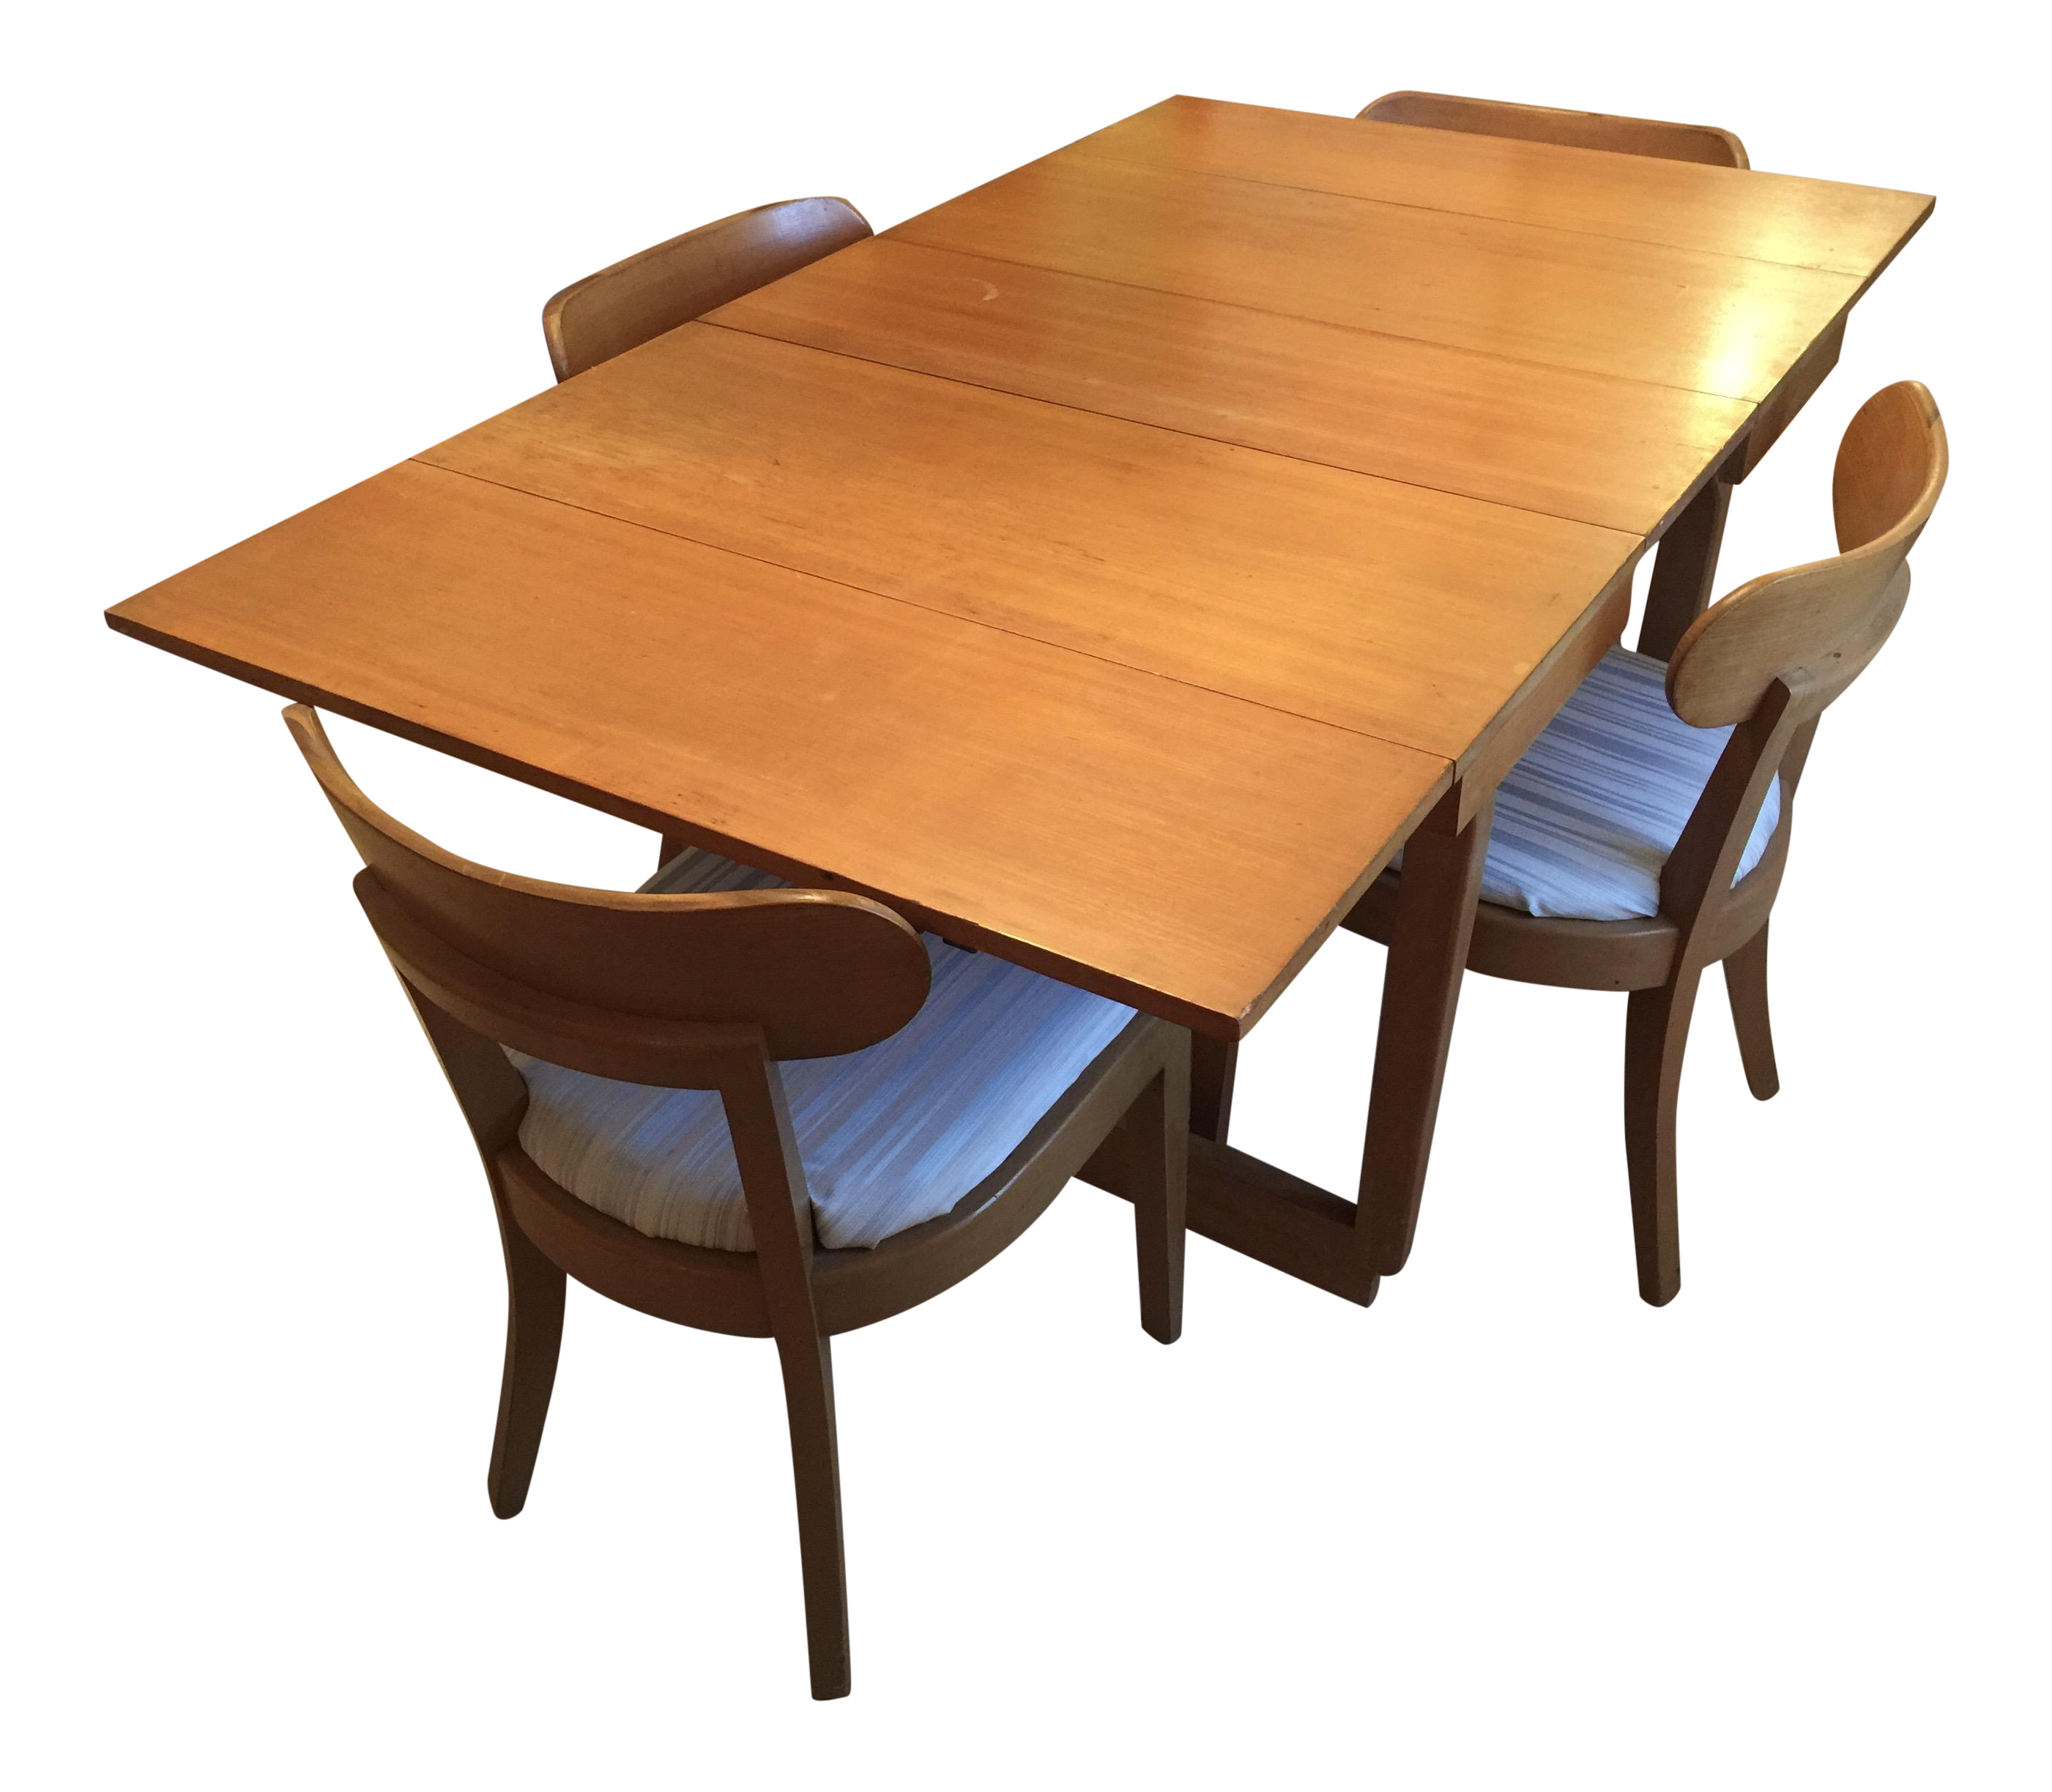 court dining travis signed drexel shop vintage sold table double s furniture company pedestal